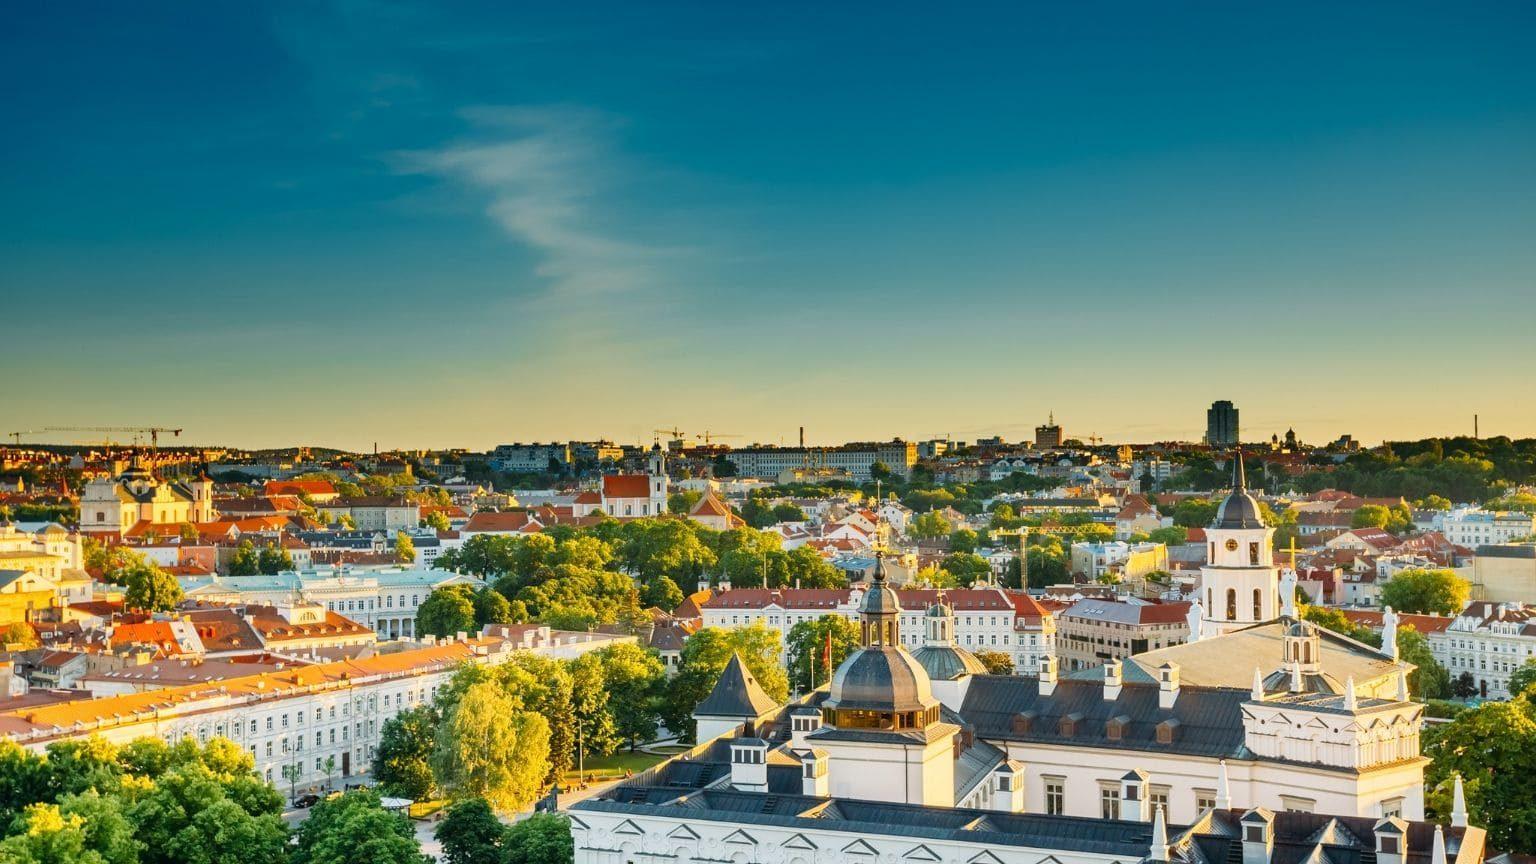 Panoramic view of Vilnius, Lithuania